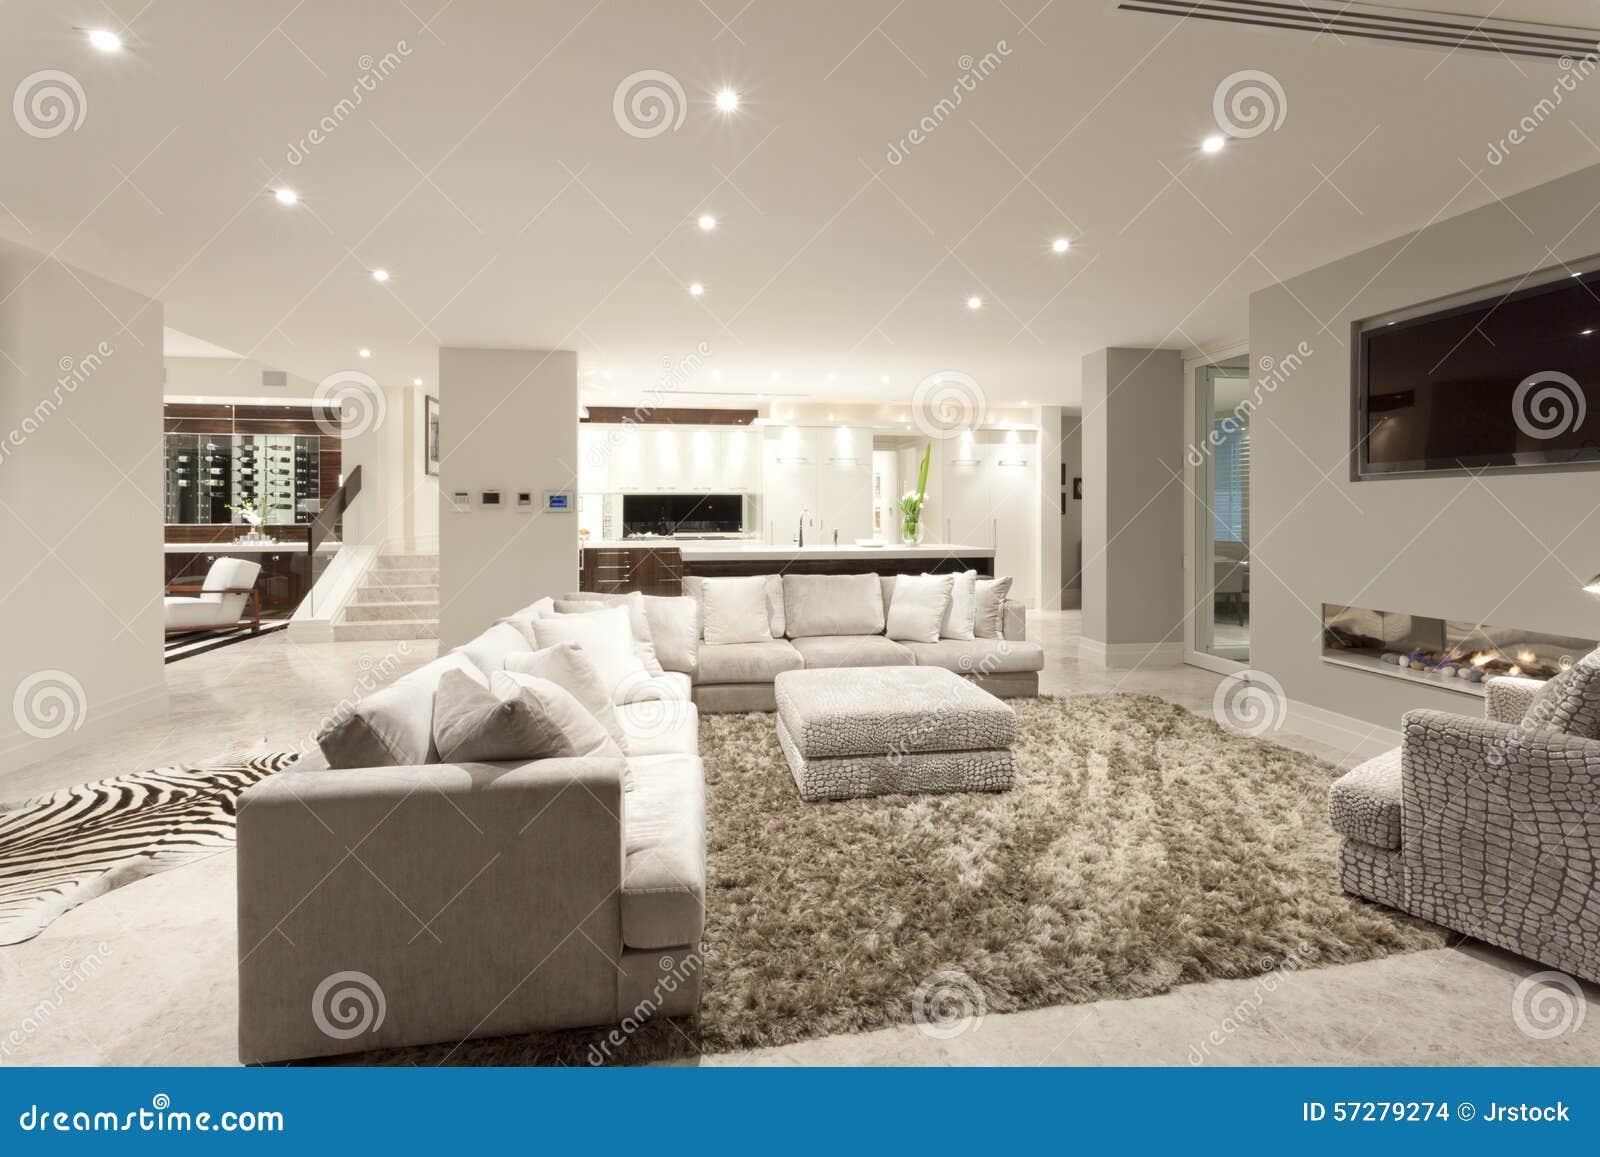 Spacious Living Room With A Big Carpet Stock Photo